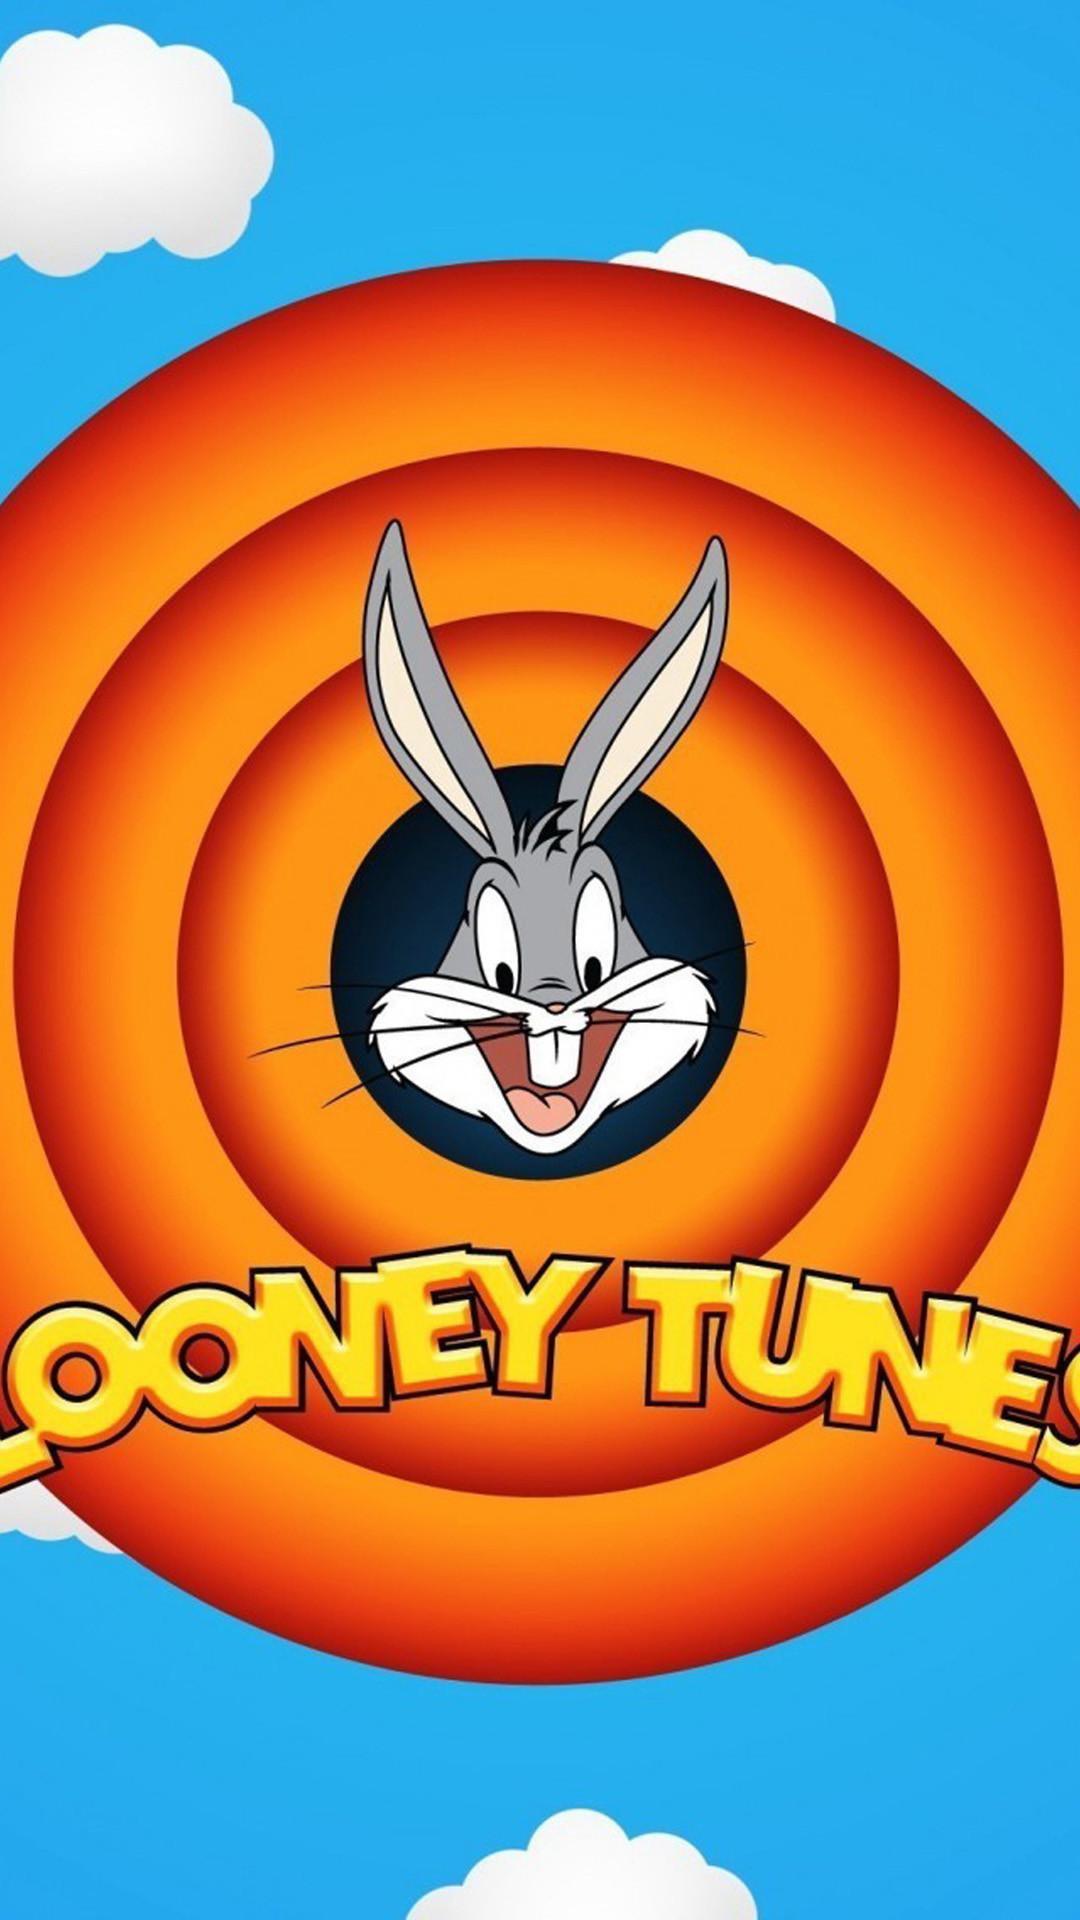 Cute Bunny Wallpaper Cartoon Bugs Bunny Backgrounds 183 ①